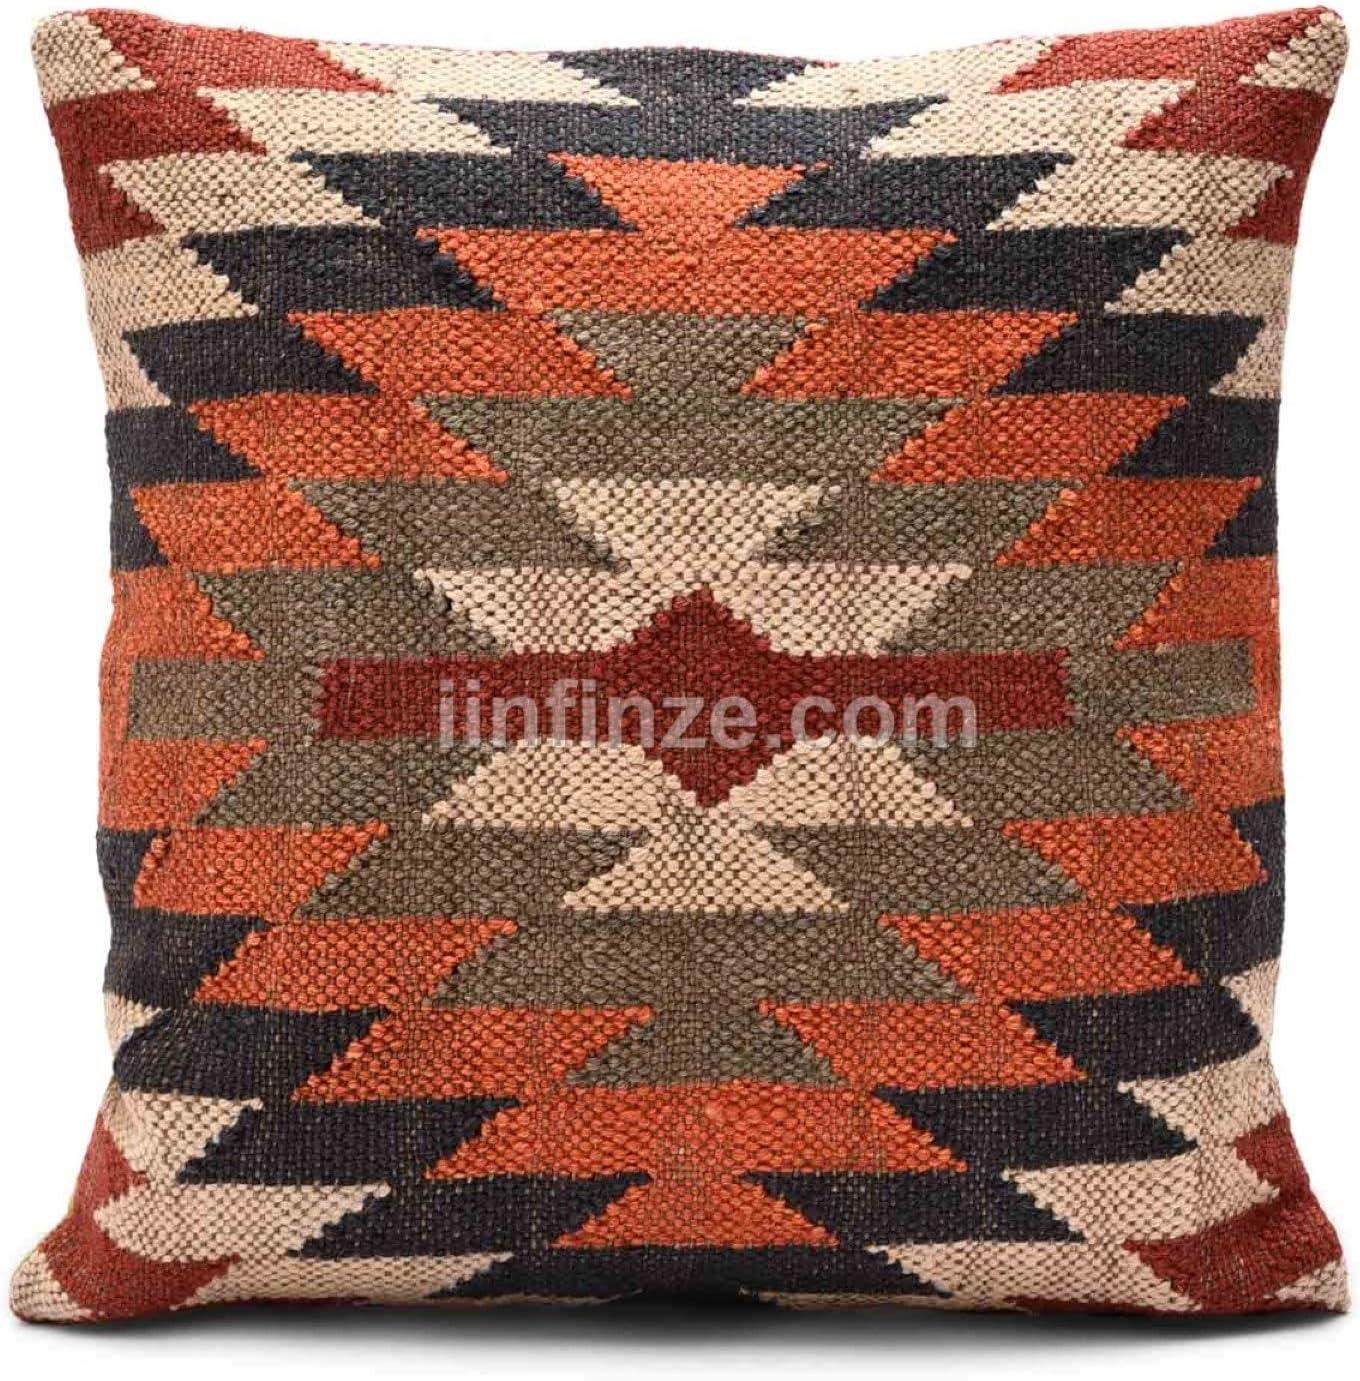 Wool Jute Hand Woven Kilim Cushion Cover Hand loom Rug Throw Rustic Pillow 1123